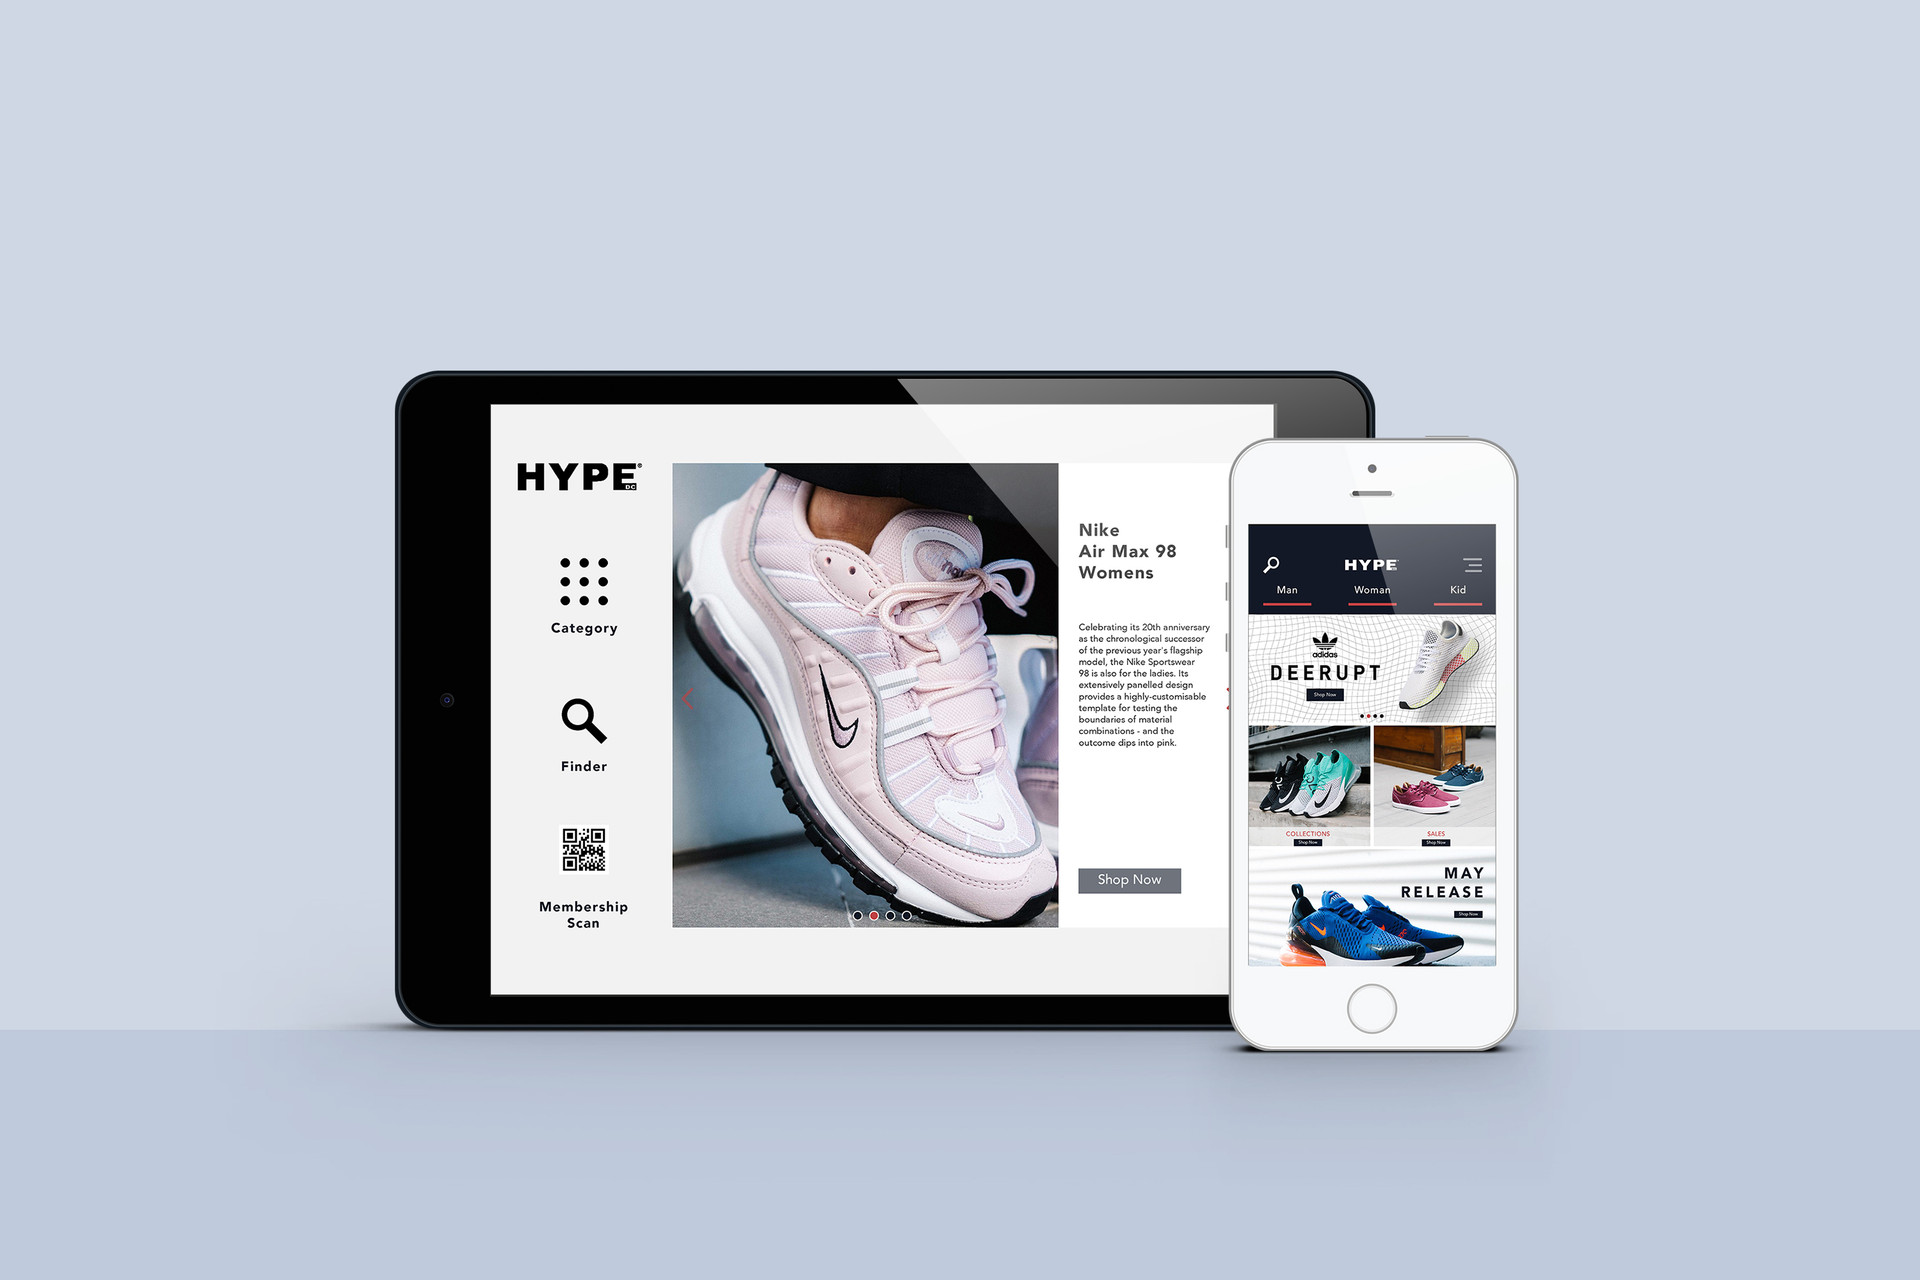 phone+ipad.jpg